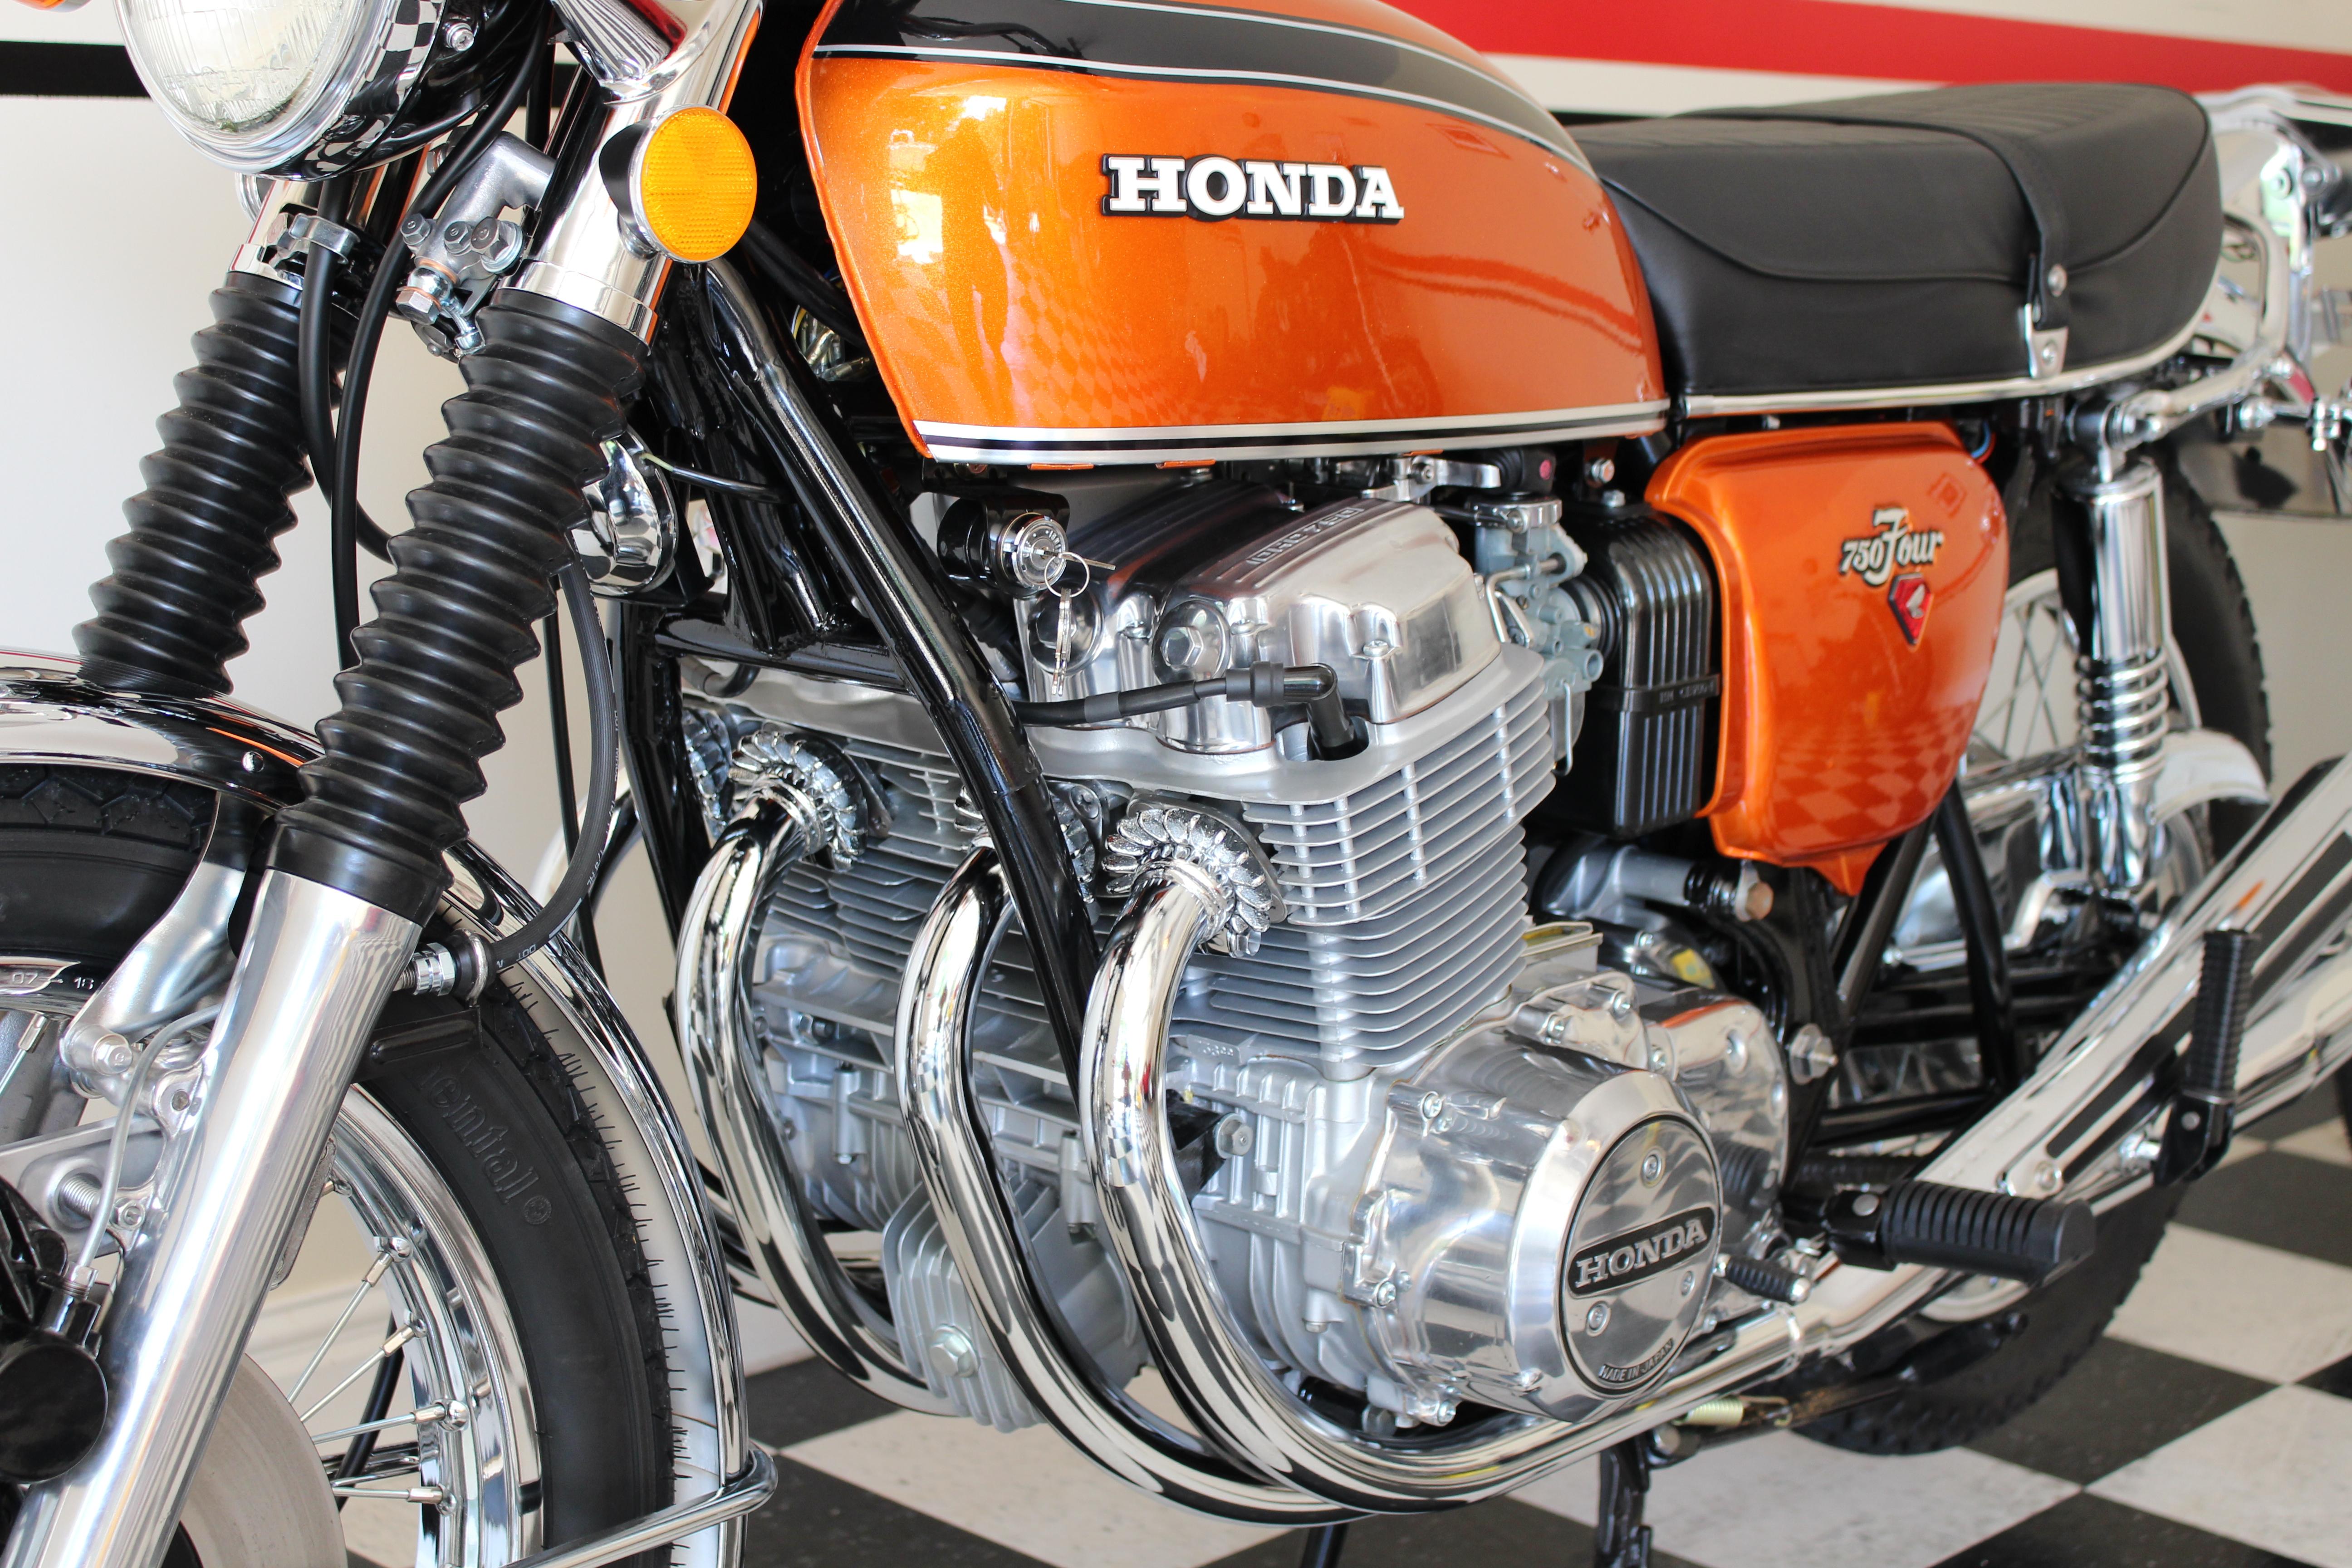 1973 honda 750 for sale in utah orange 1972 honda 750 1972 honda 750 orange right side publicscrutiny Choice Image